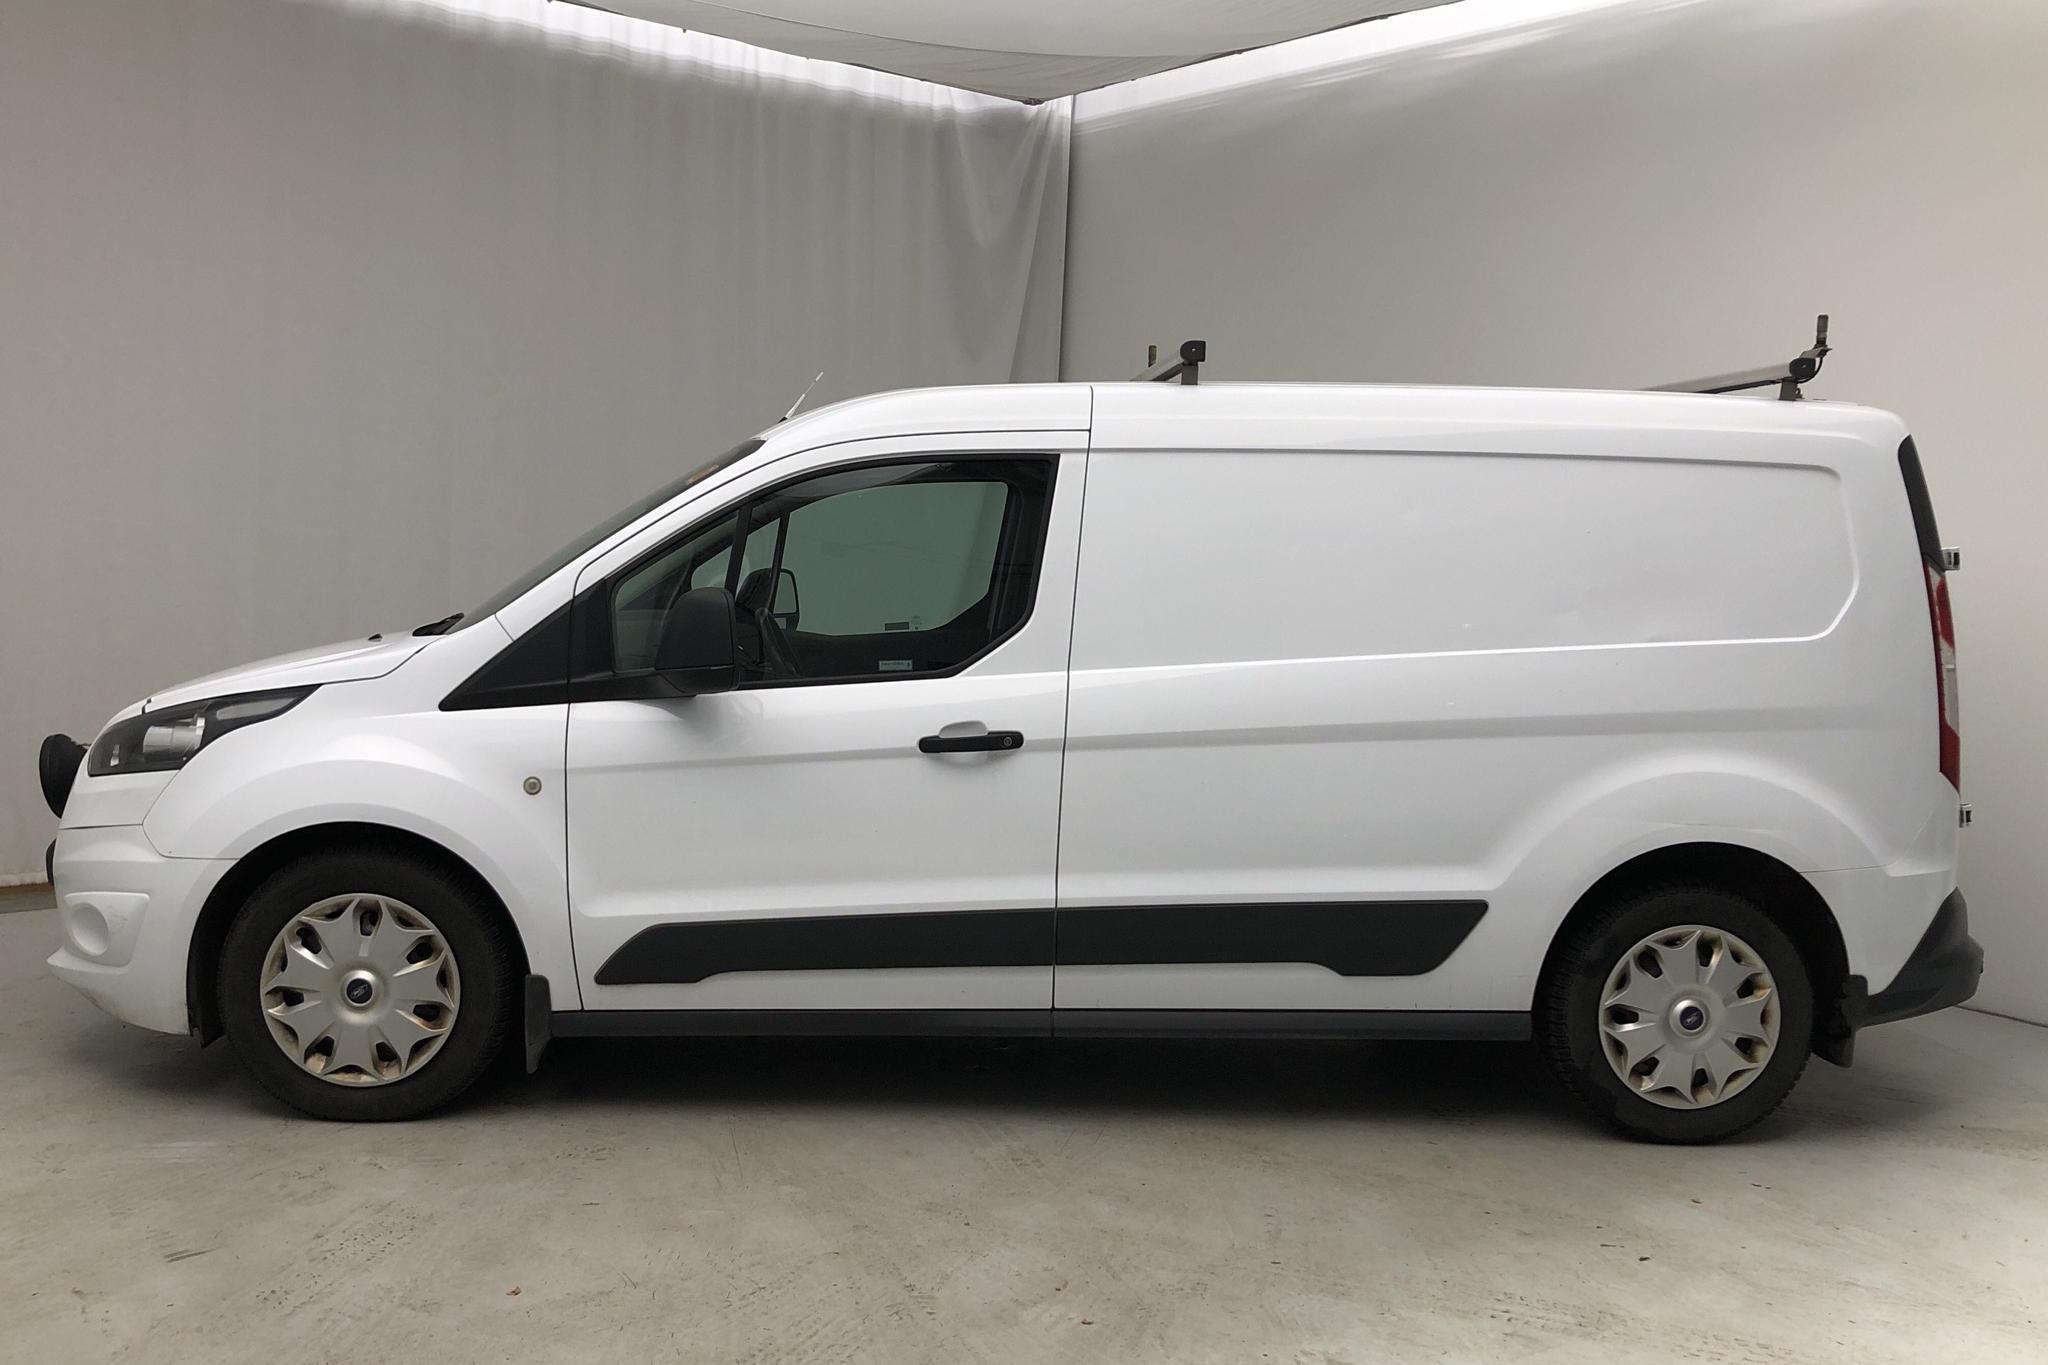 Ford Transit Connect 1.6 TDCi (95hk) - 11 480 mil - Manuell - vit - 2015